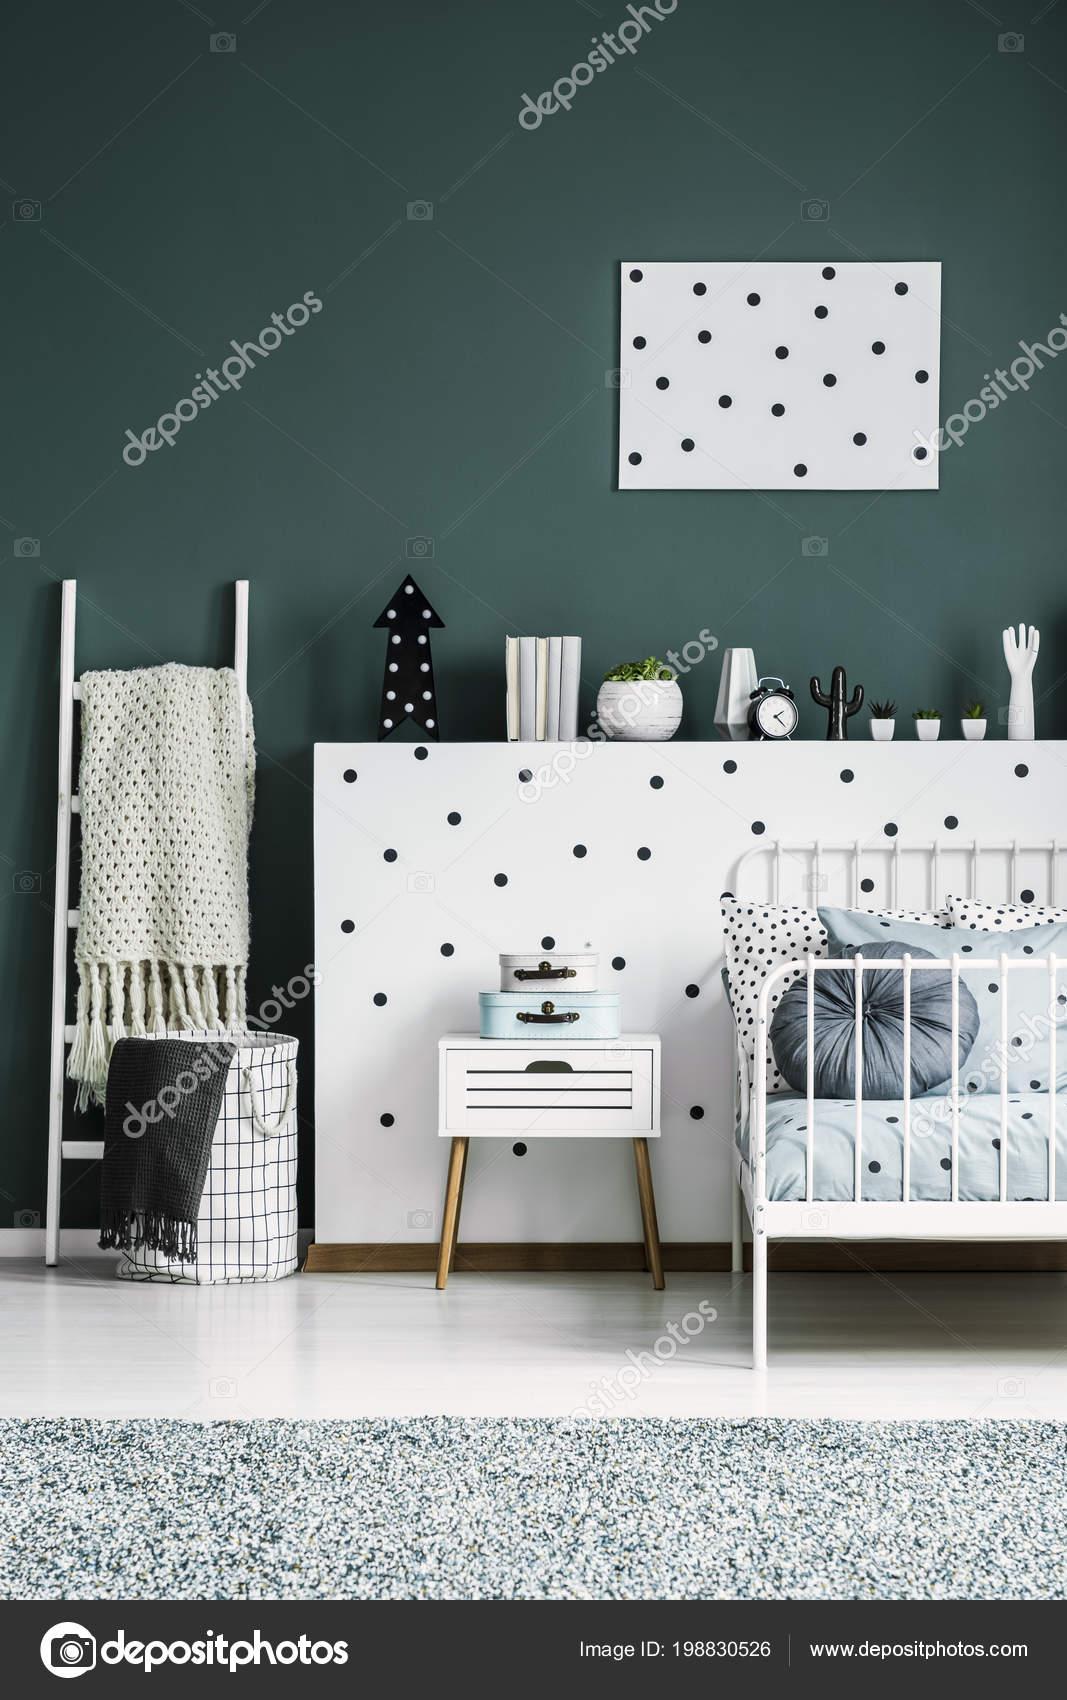 https://st4.depositphotos.com/2249091/19883/i/1600/depositphotos_198830526-stockafbeelding-gedessineerde-poster-groene-muur-boven.jpg